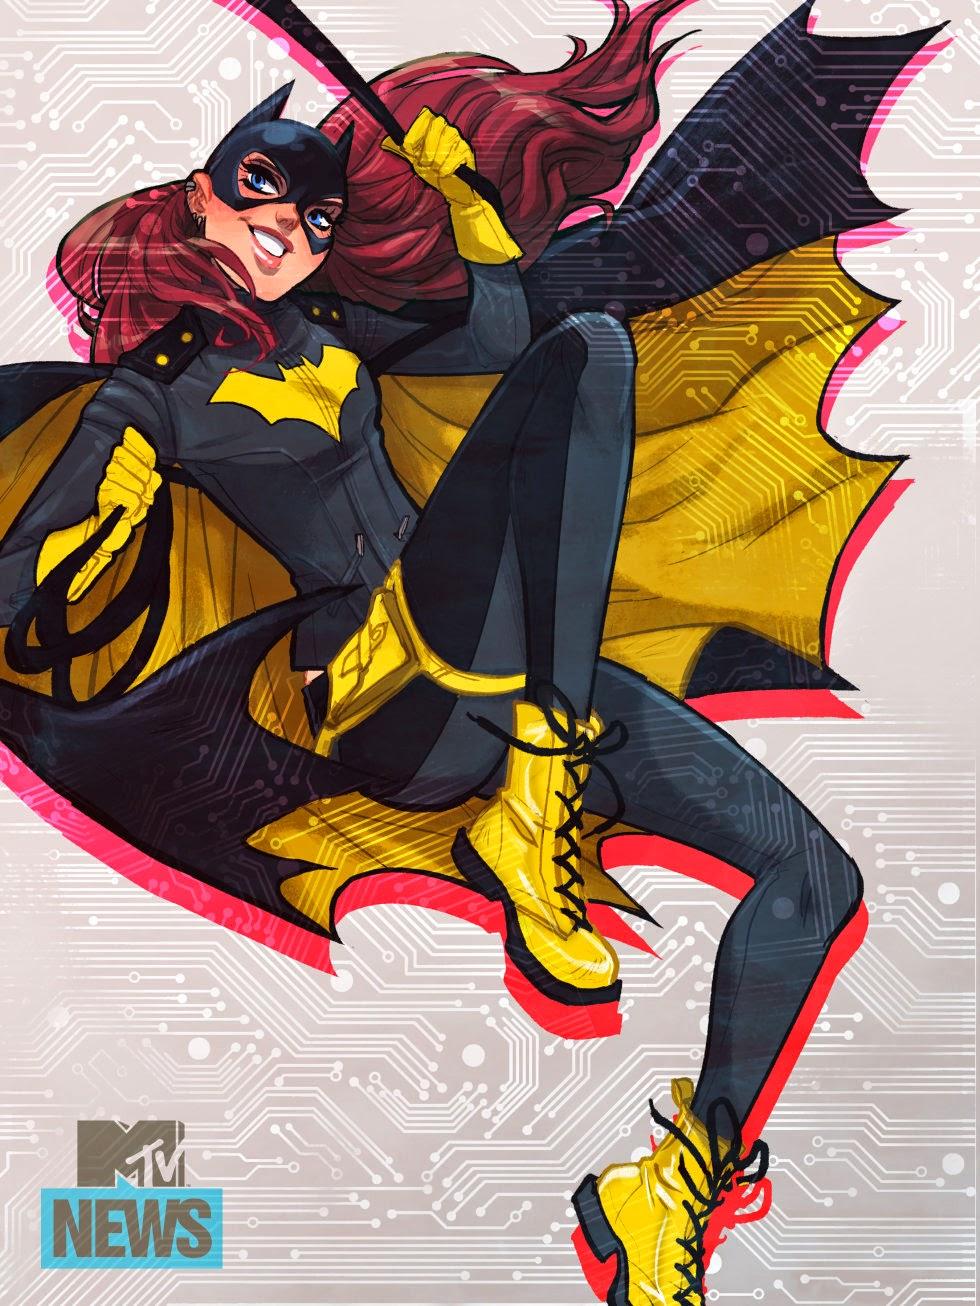 Batgirl Vol 1 The Darkest Reflection The New 52